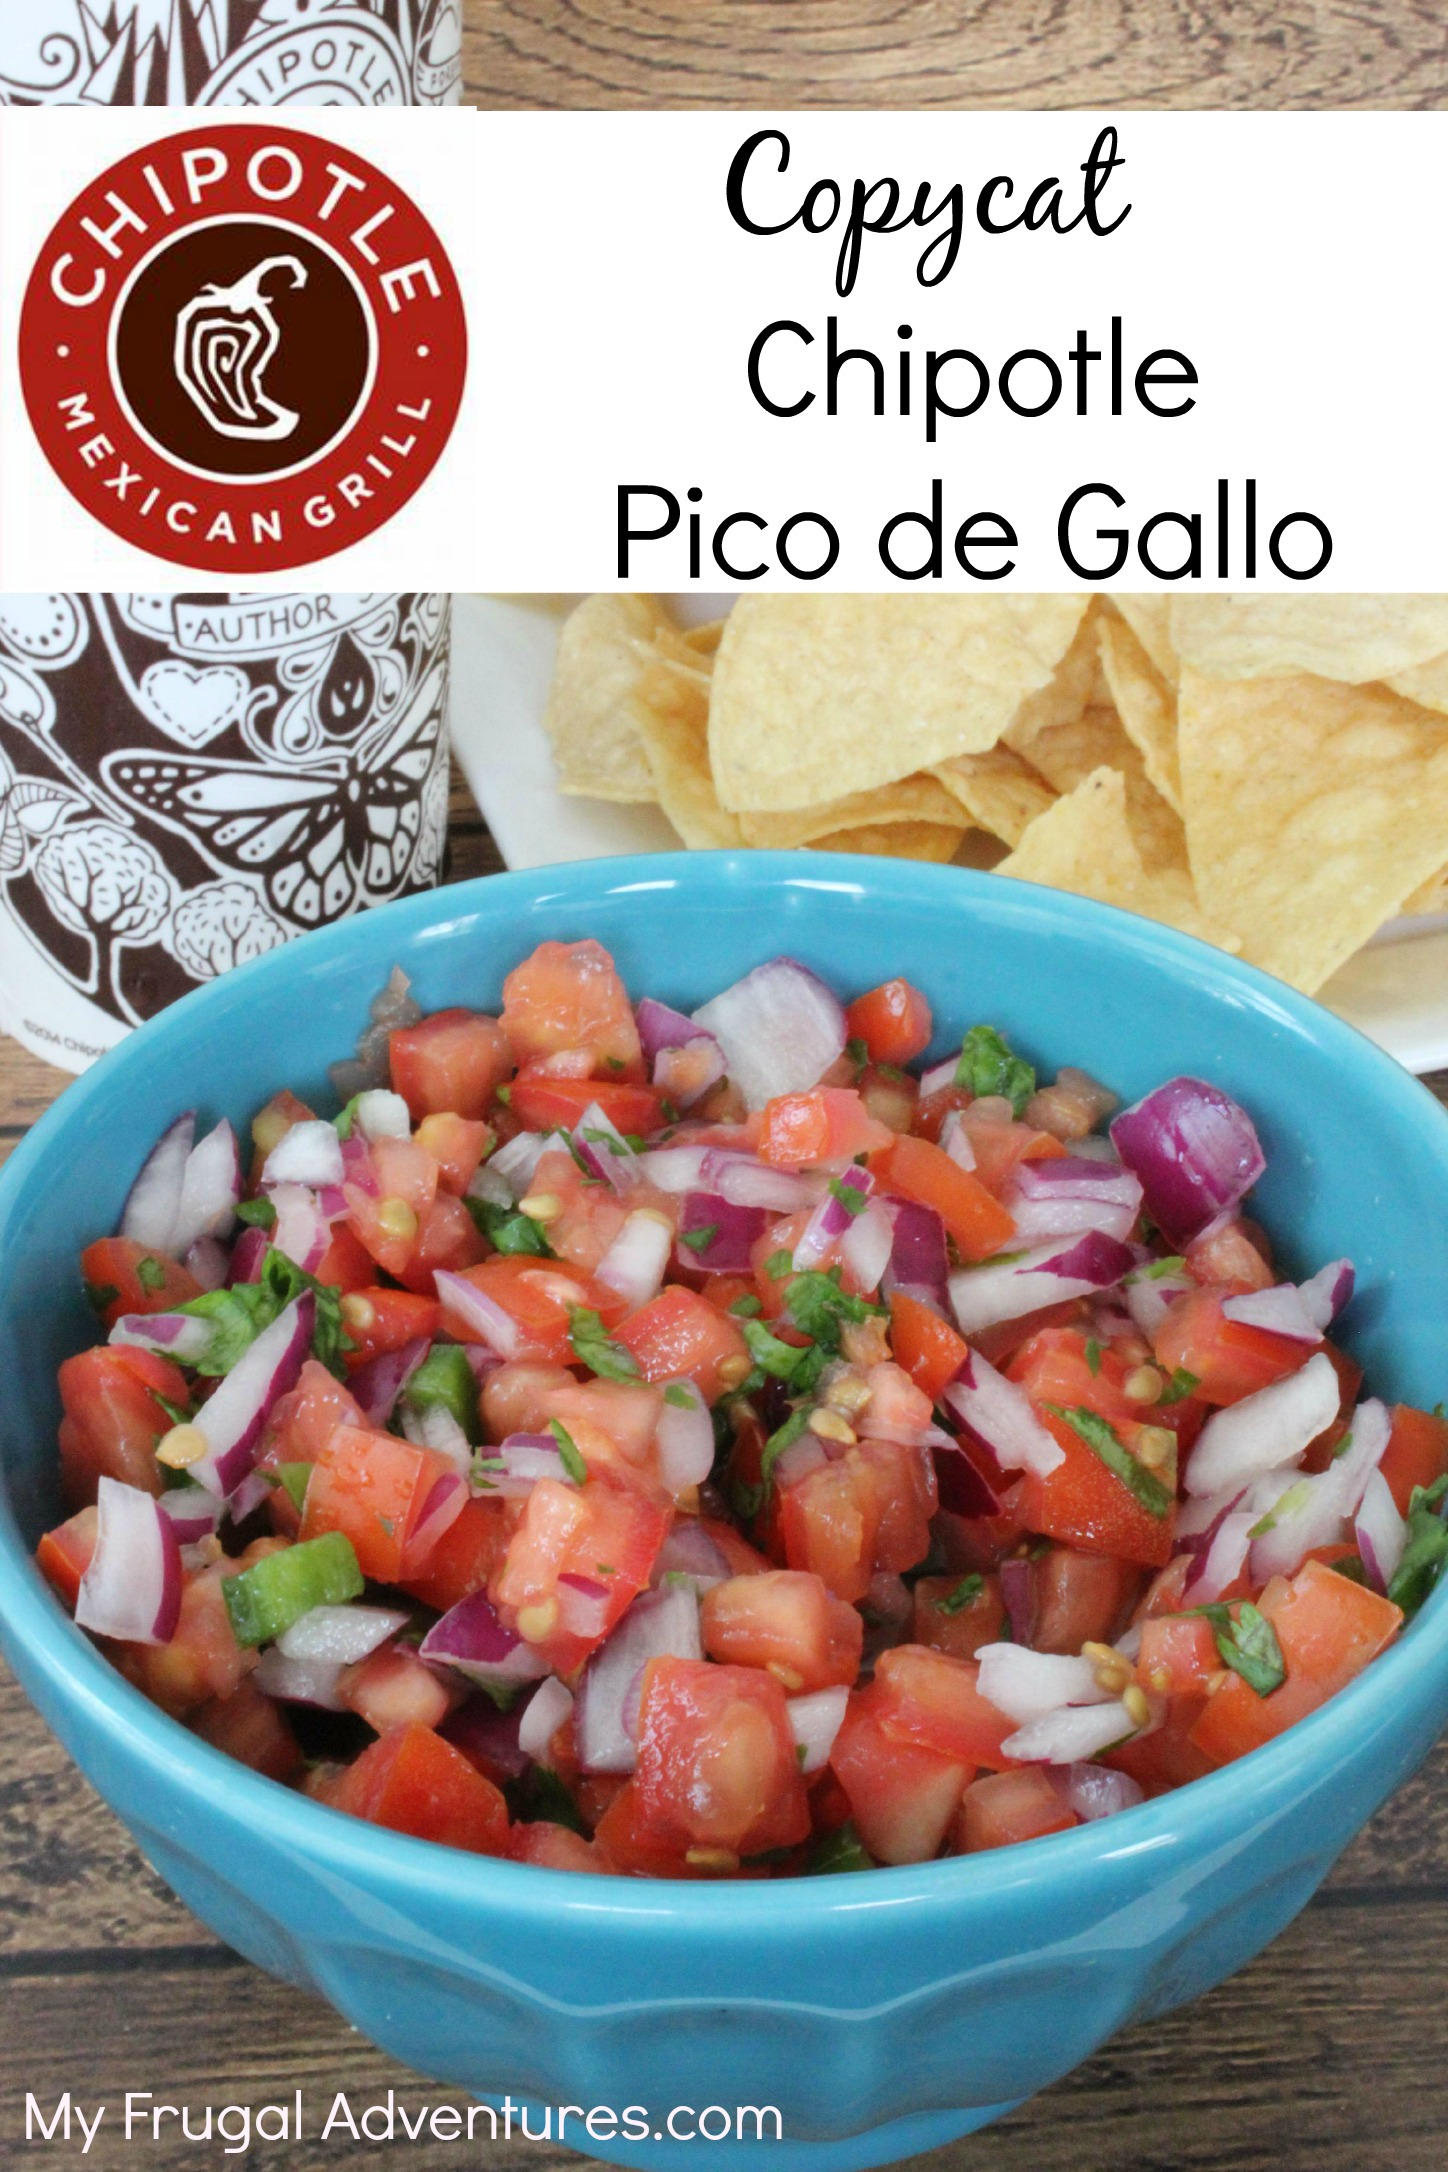 Gallo By Thian Different Ways To Wear A Scarf: Easy Copycat Chipotle Pico De Gallo Recipe